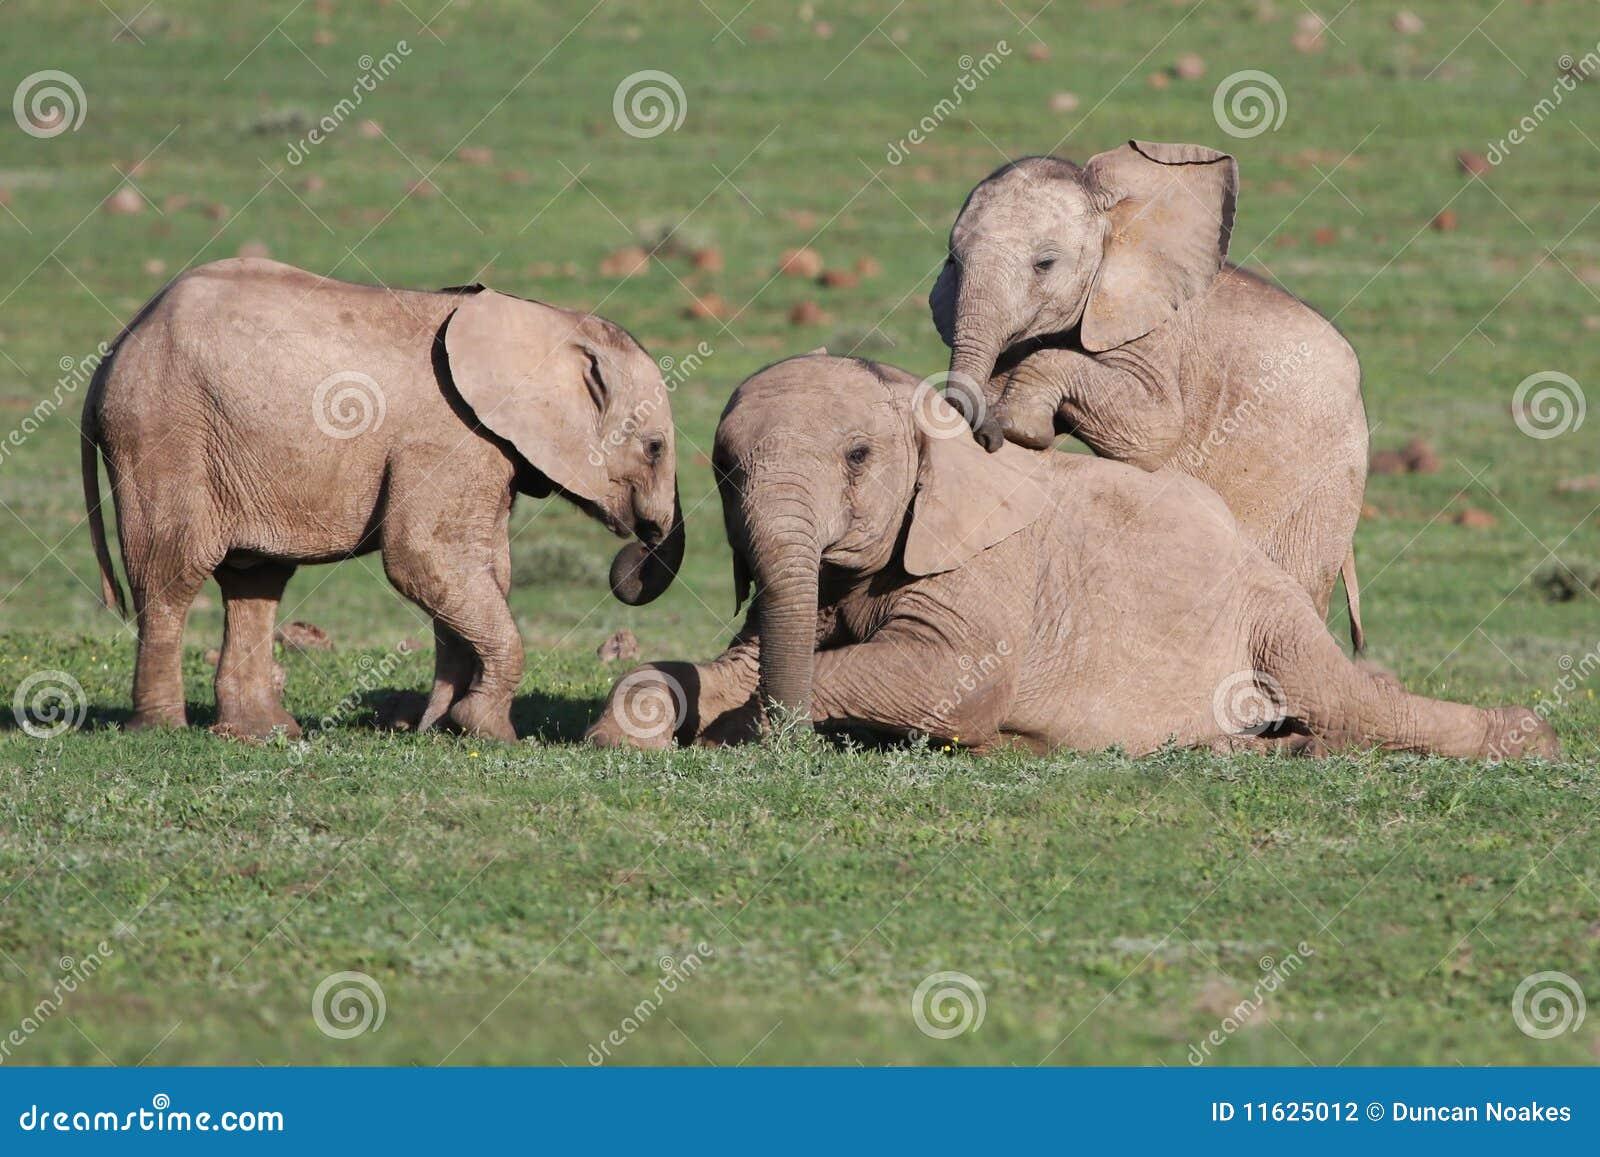 Baby Elephants Playing Games Stock Photo Image 11625012